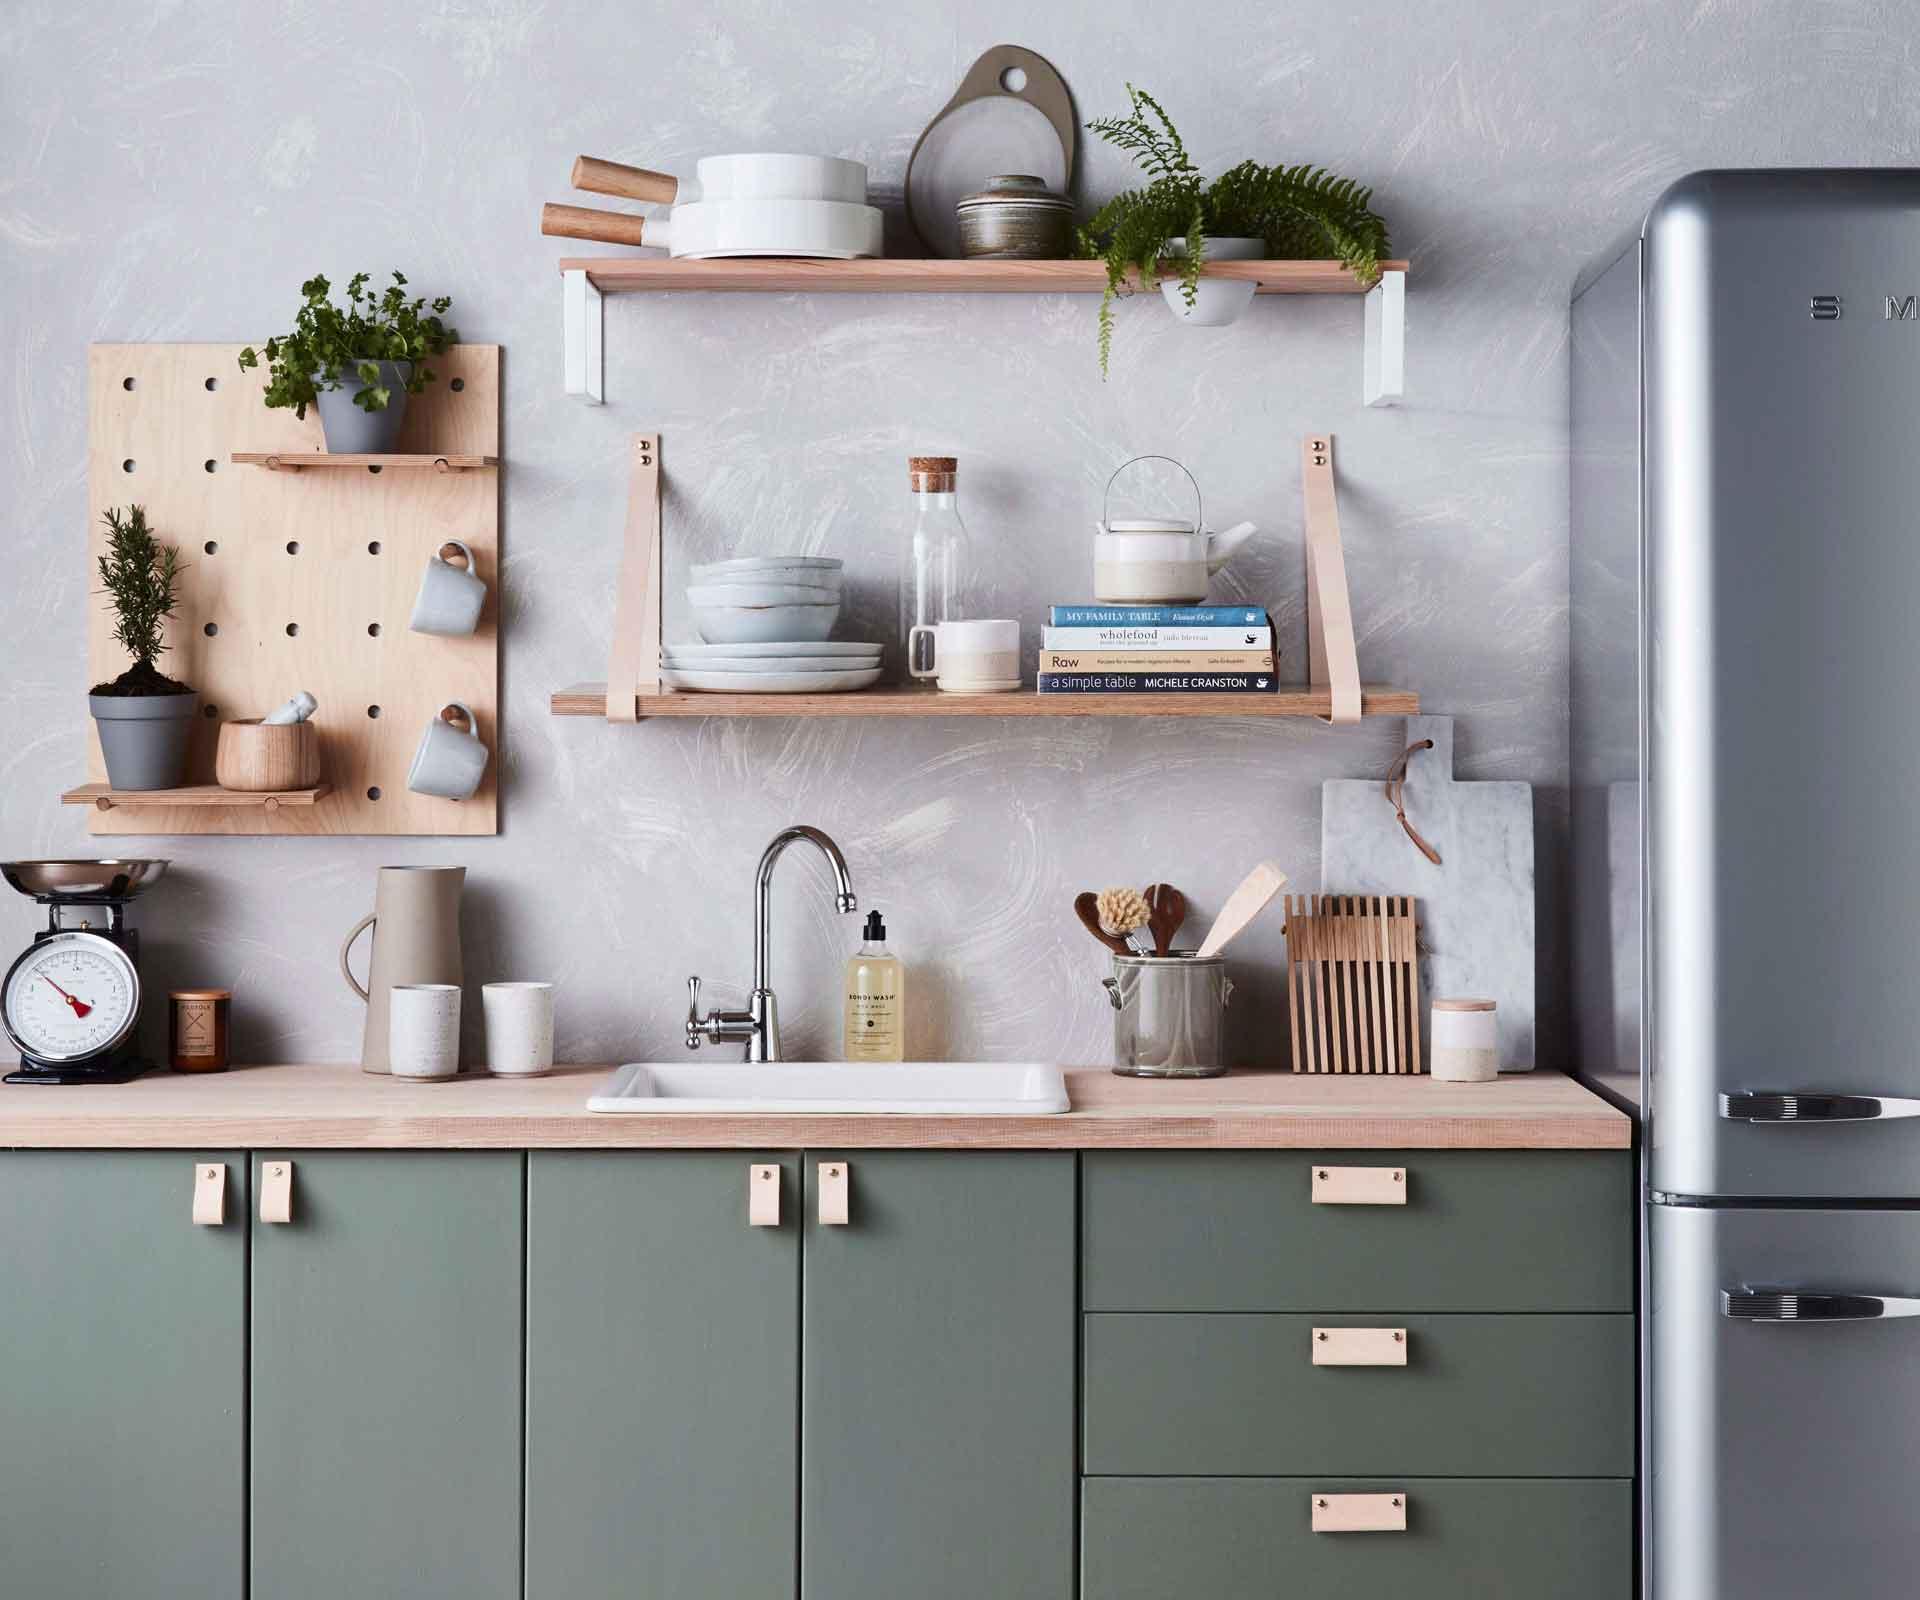 Floating shelves for kitchen | Source: homestolove.co.nz